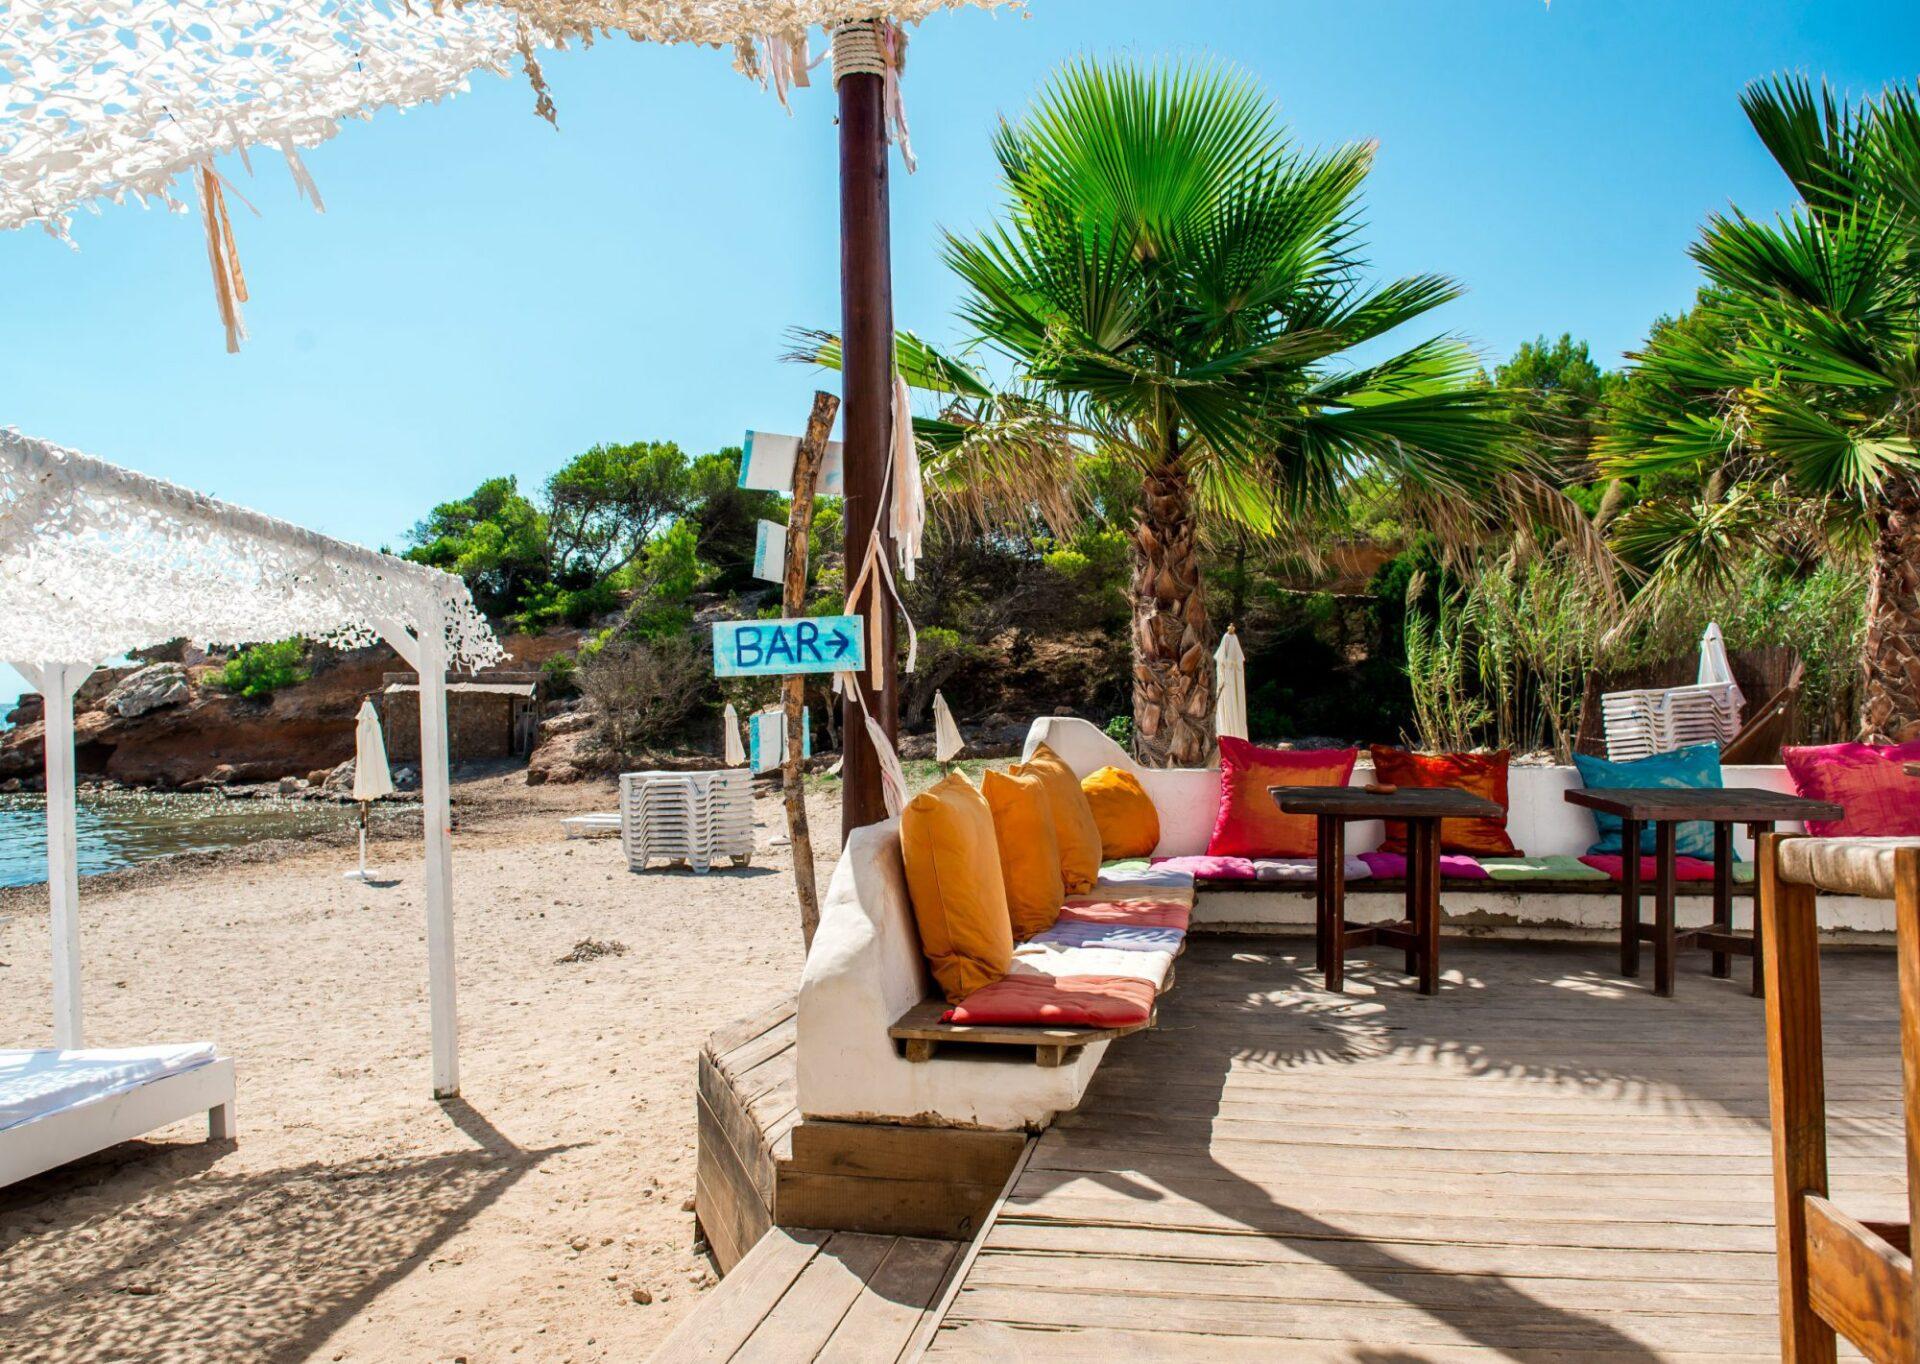 shutterstock 323468822 e1560252263600 De leukste plekken om te eten, shoppen, dansen en relaxen op Ibiza volgens local Juliette